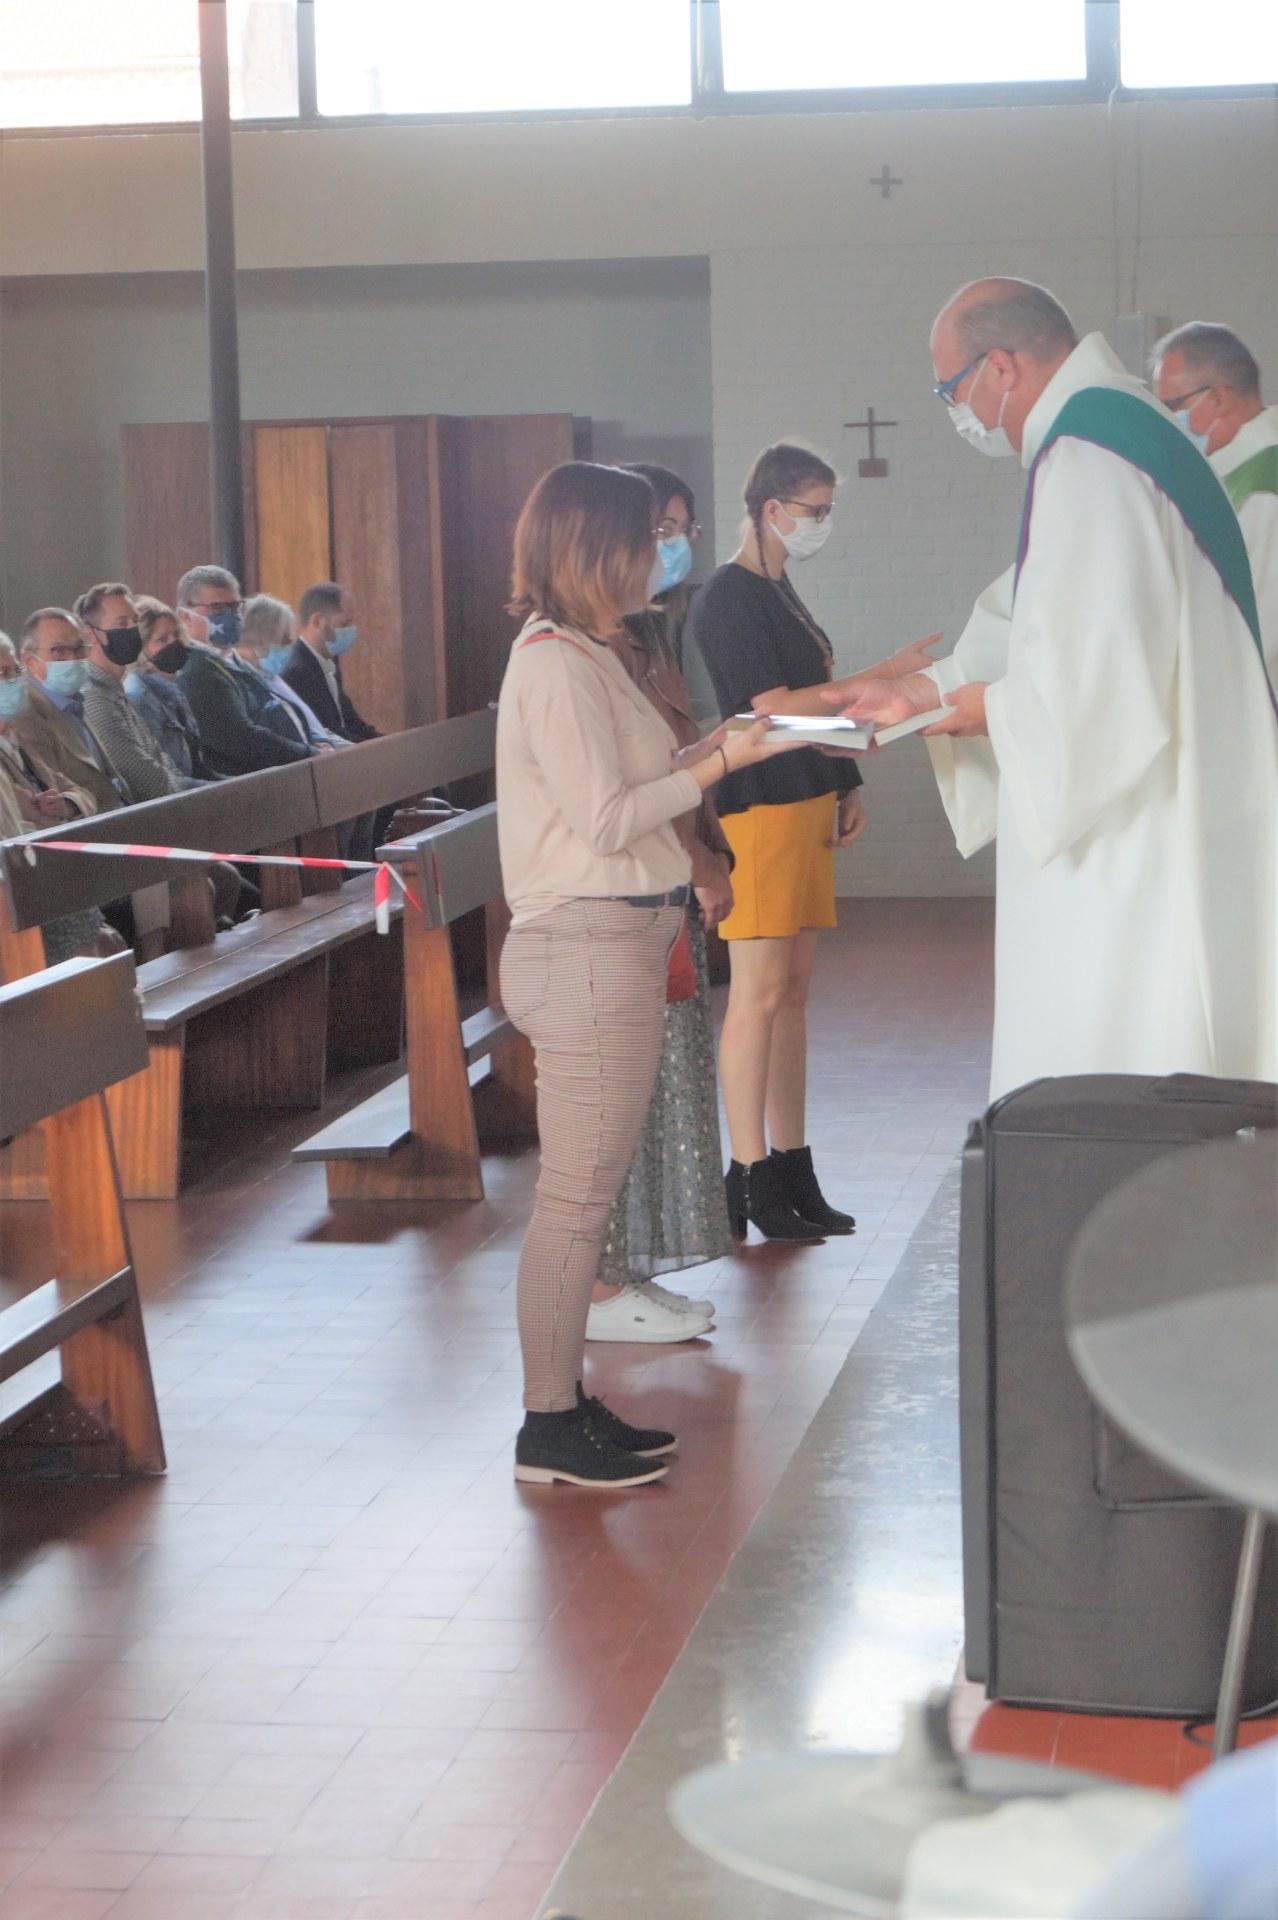 entree en catechumenat 6 sept 2020 (37)